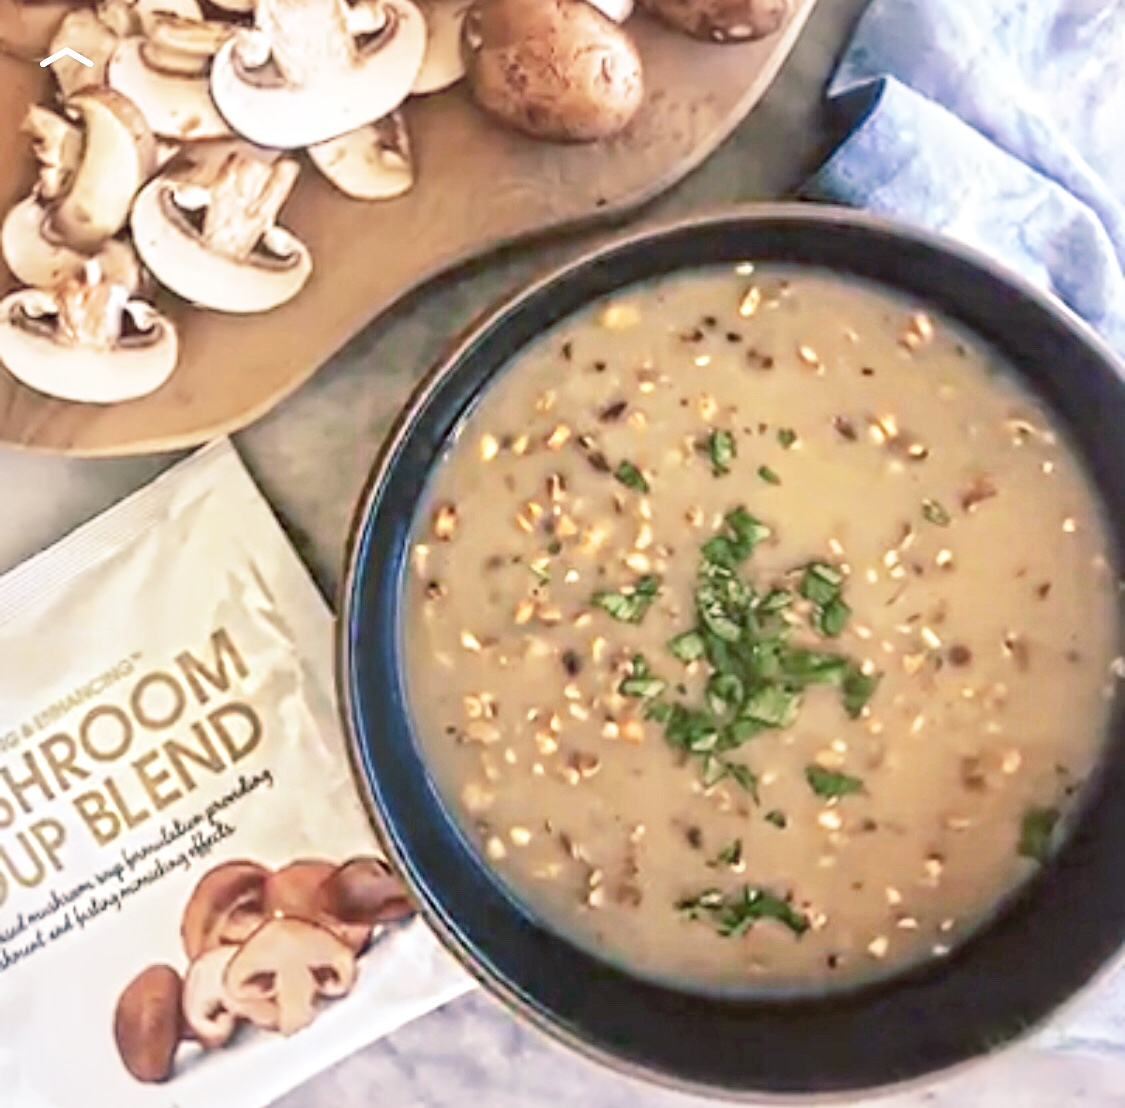 ProLon Fast Mimicking Diet (FMD) Mushroom Soup